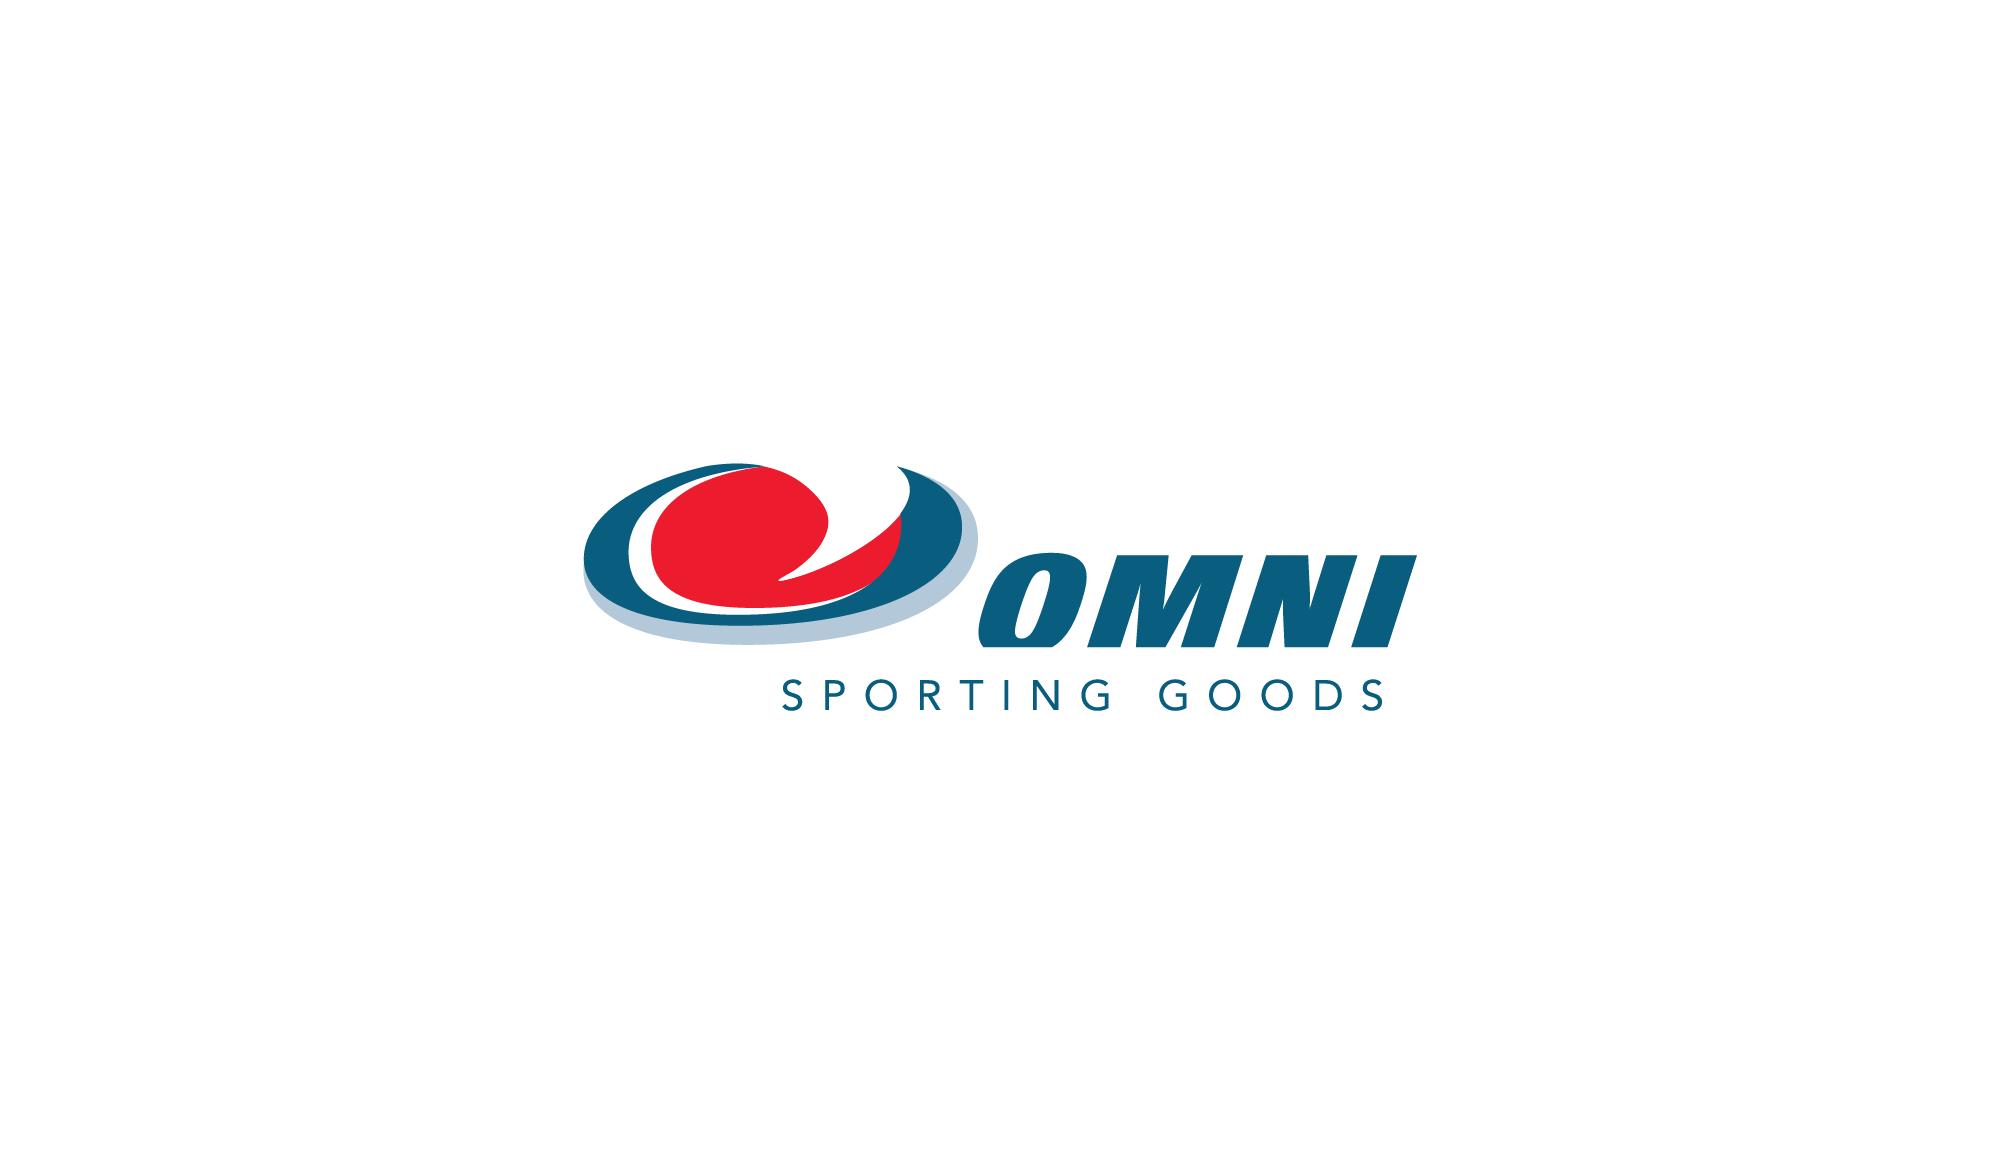 sb-logo-omni-sports-25